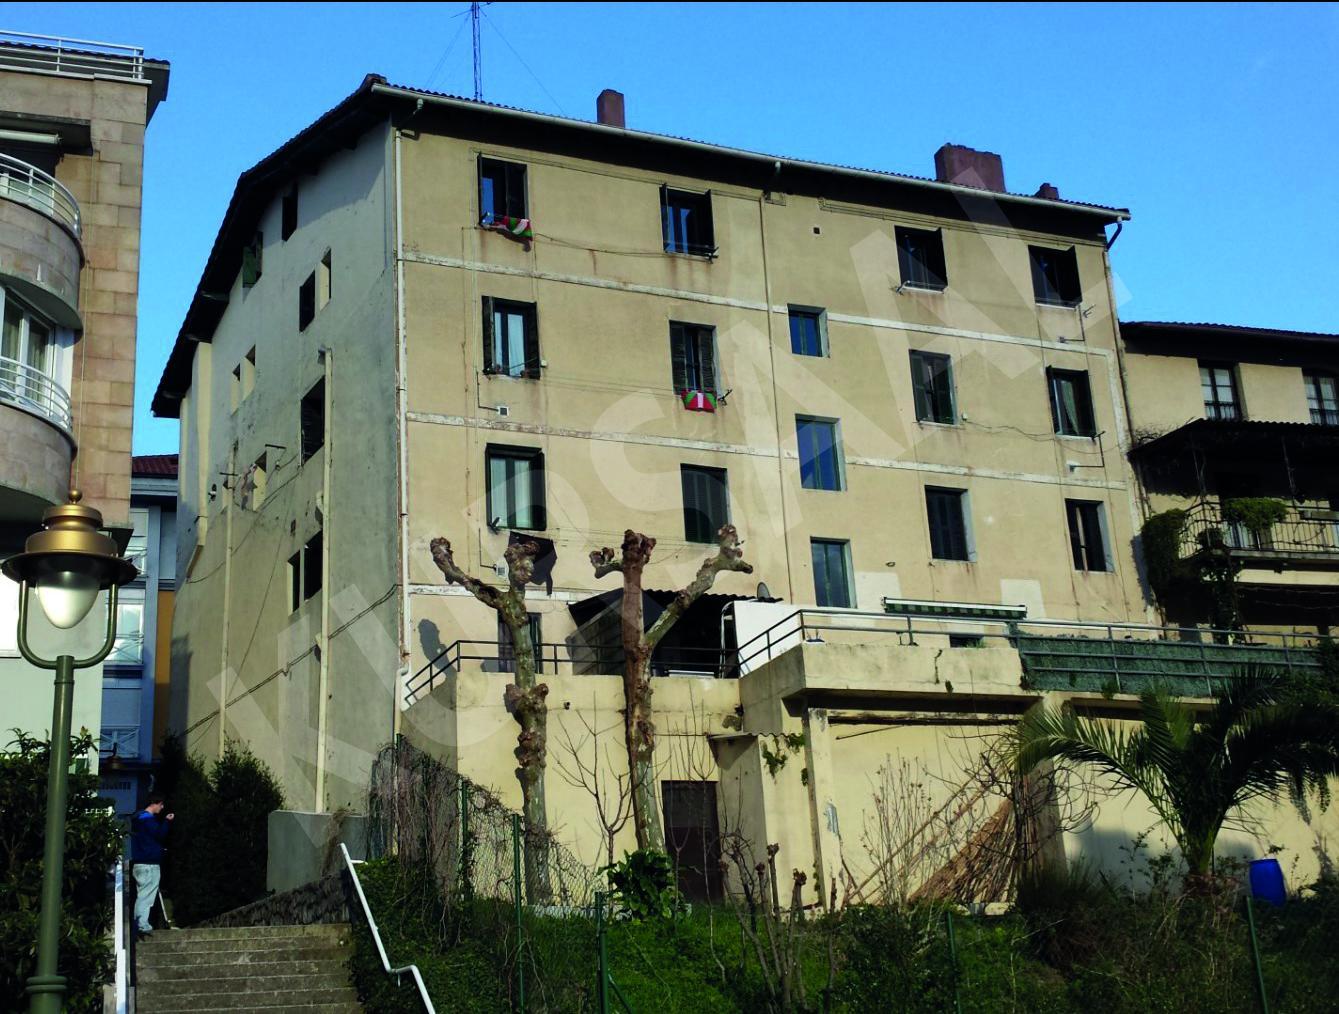 foto 3 - Restauración y patrimonio-Nagusia 35-USURBIL, GIPUZKOA